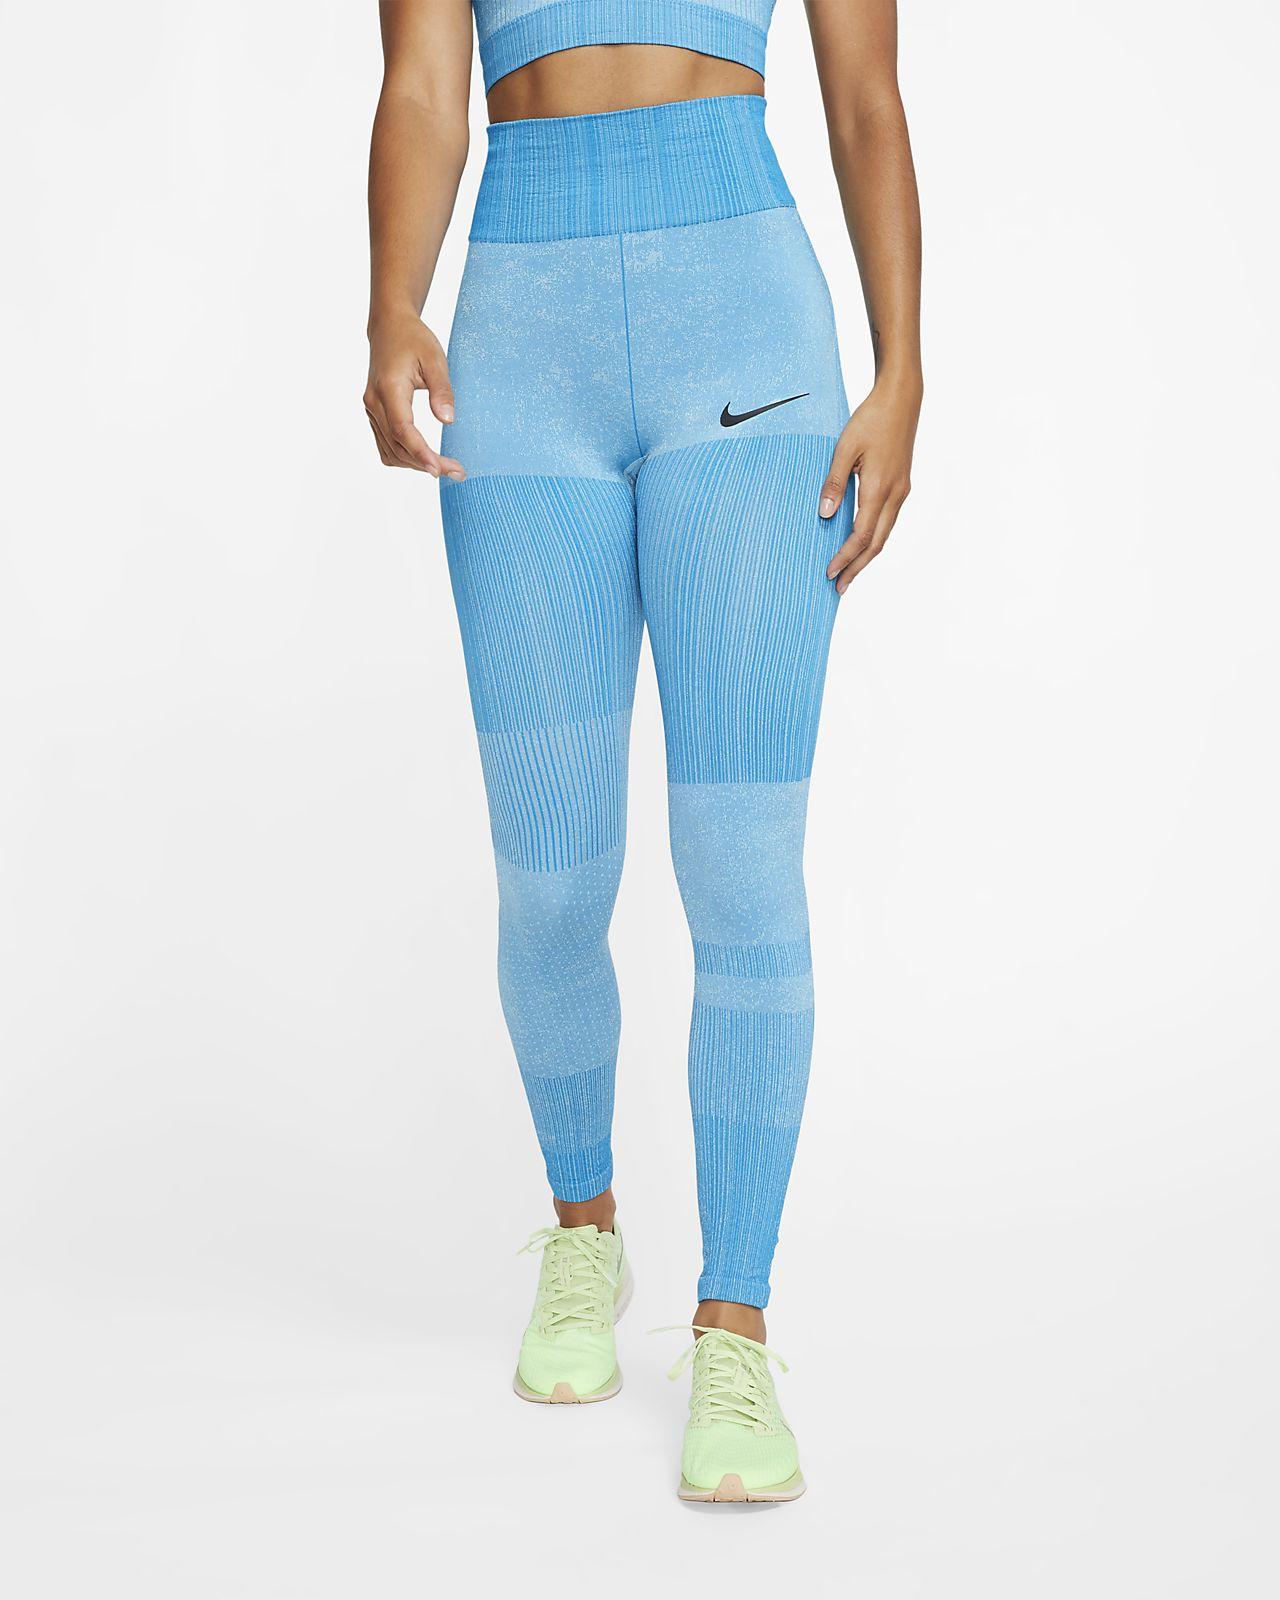 Nike City Ready Strick-Trainingstights für Damen